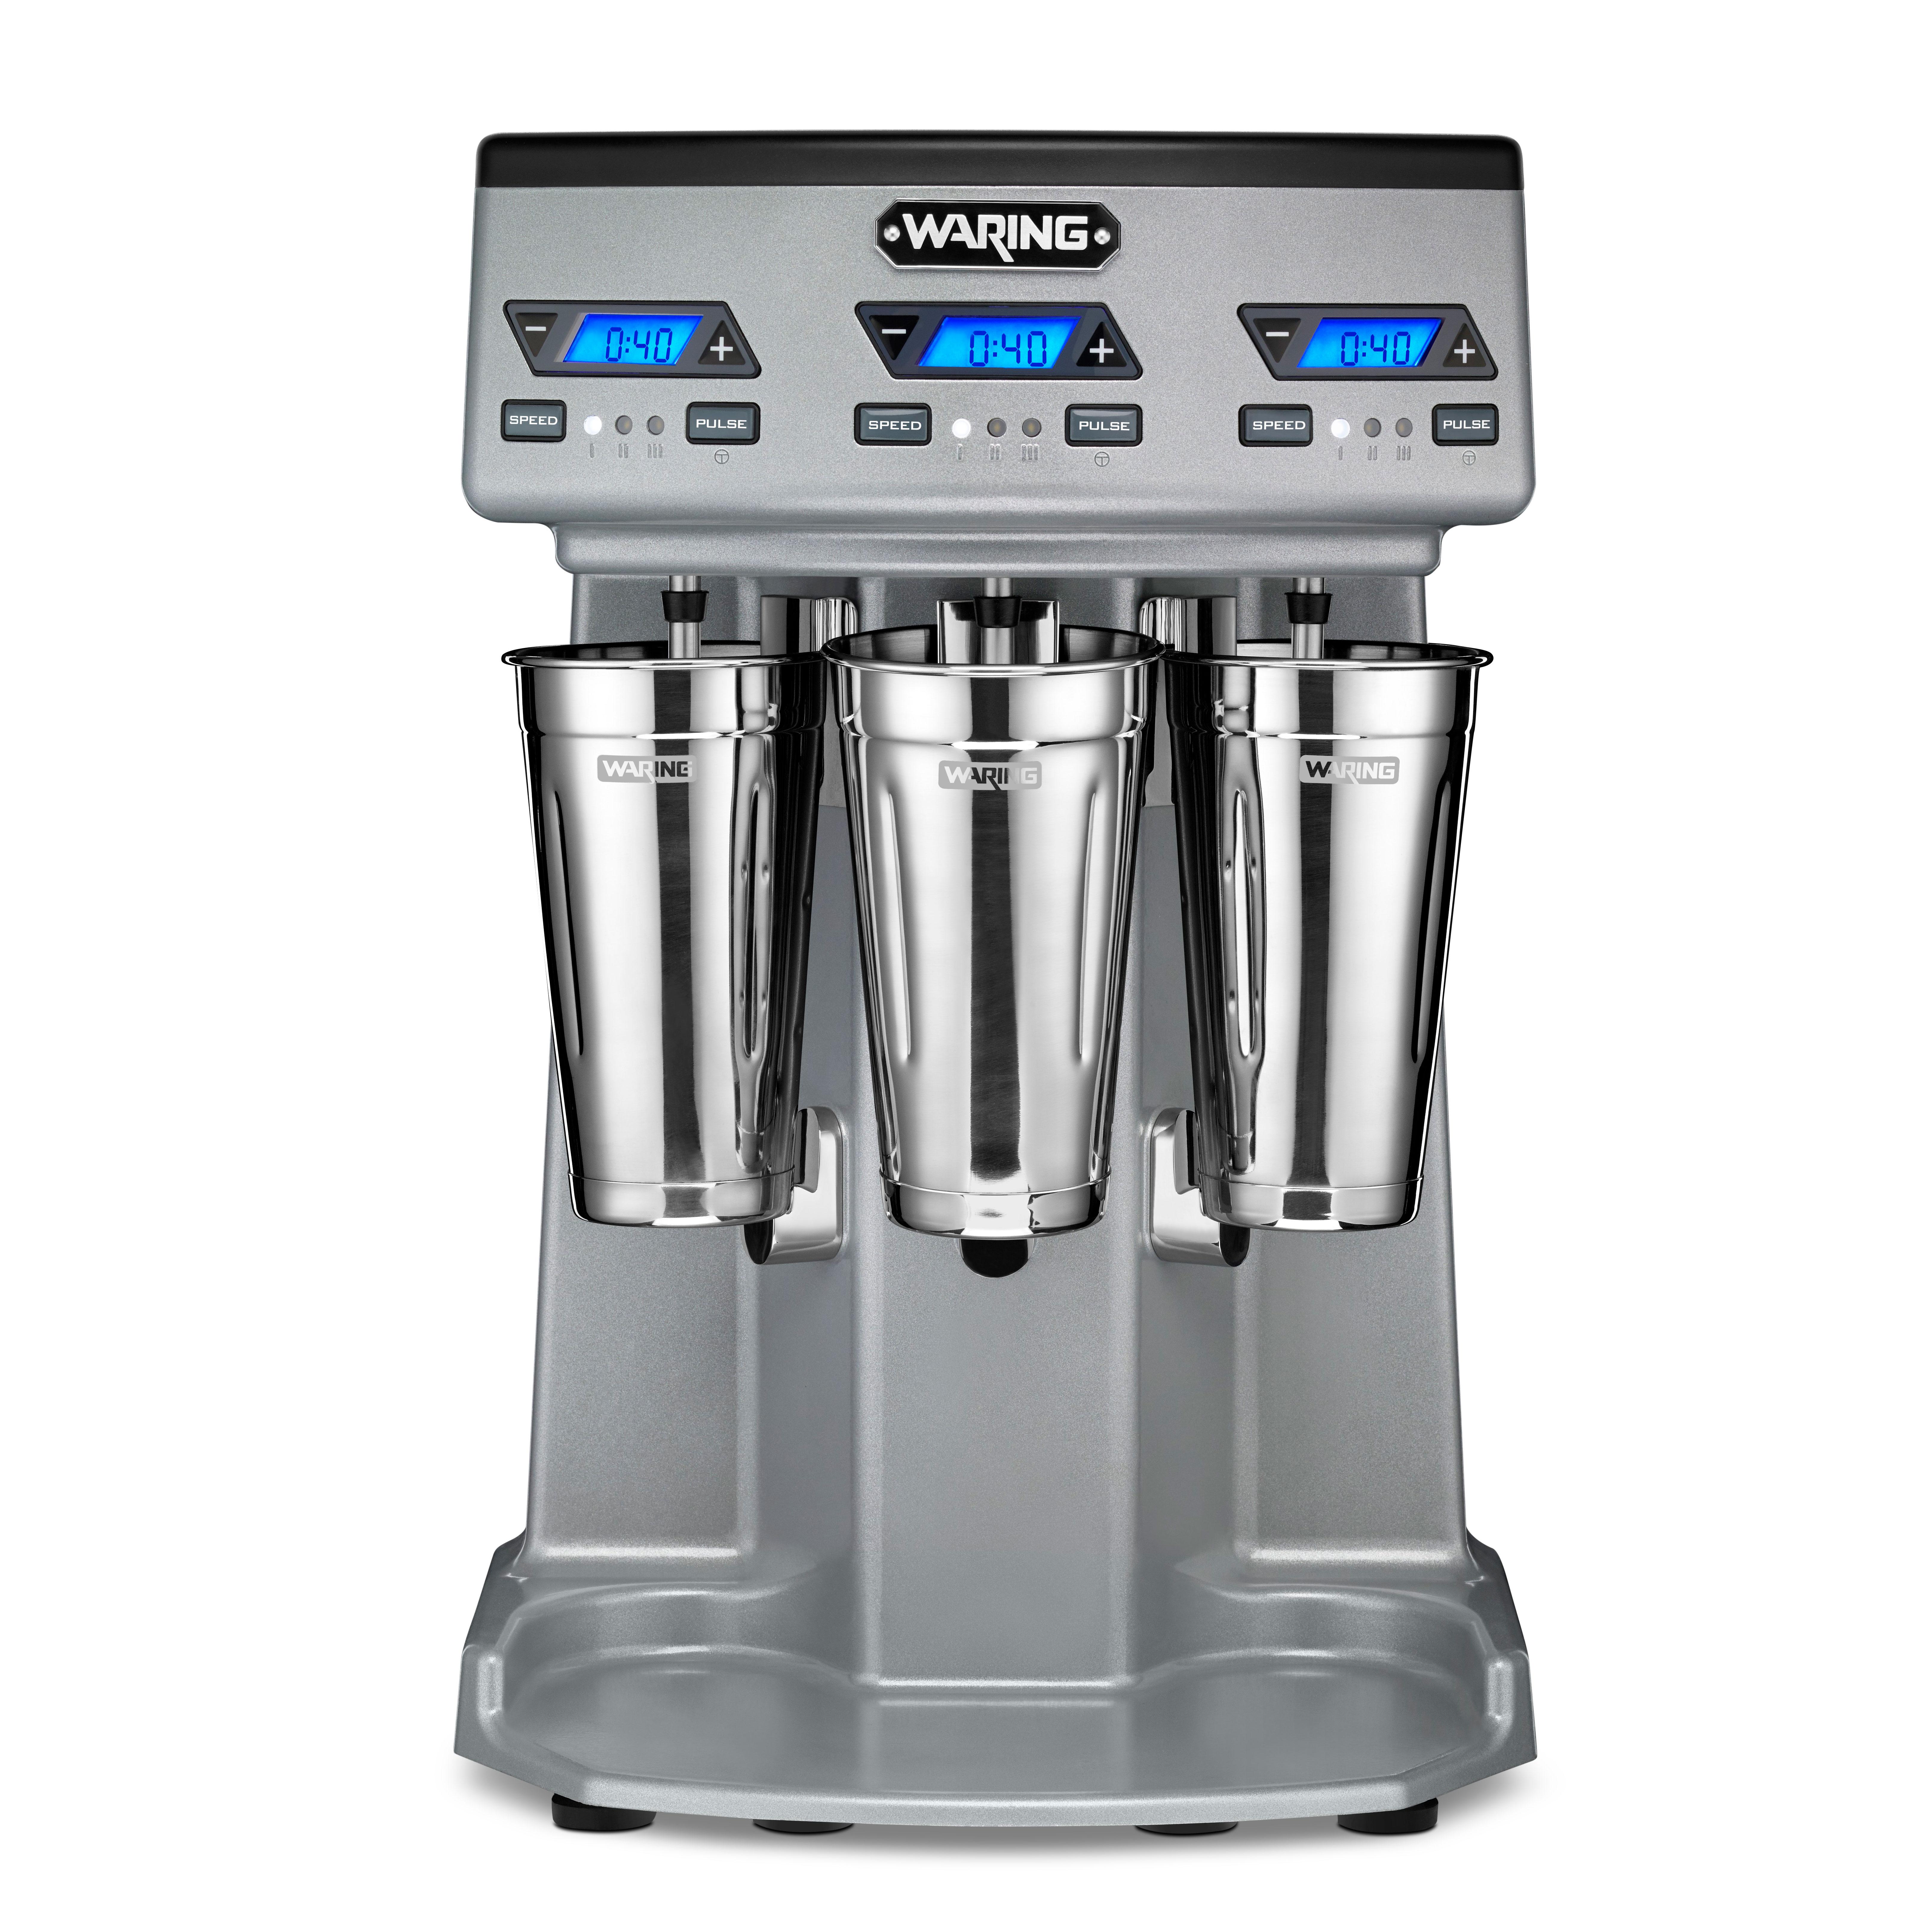 Waring WDM360TX mixer, drink / bar